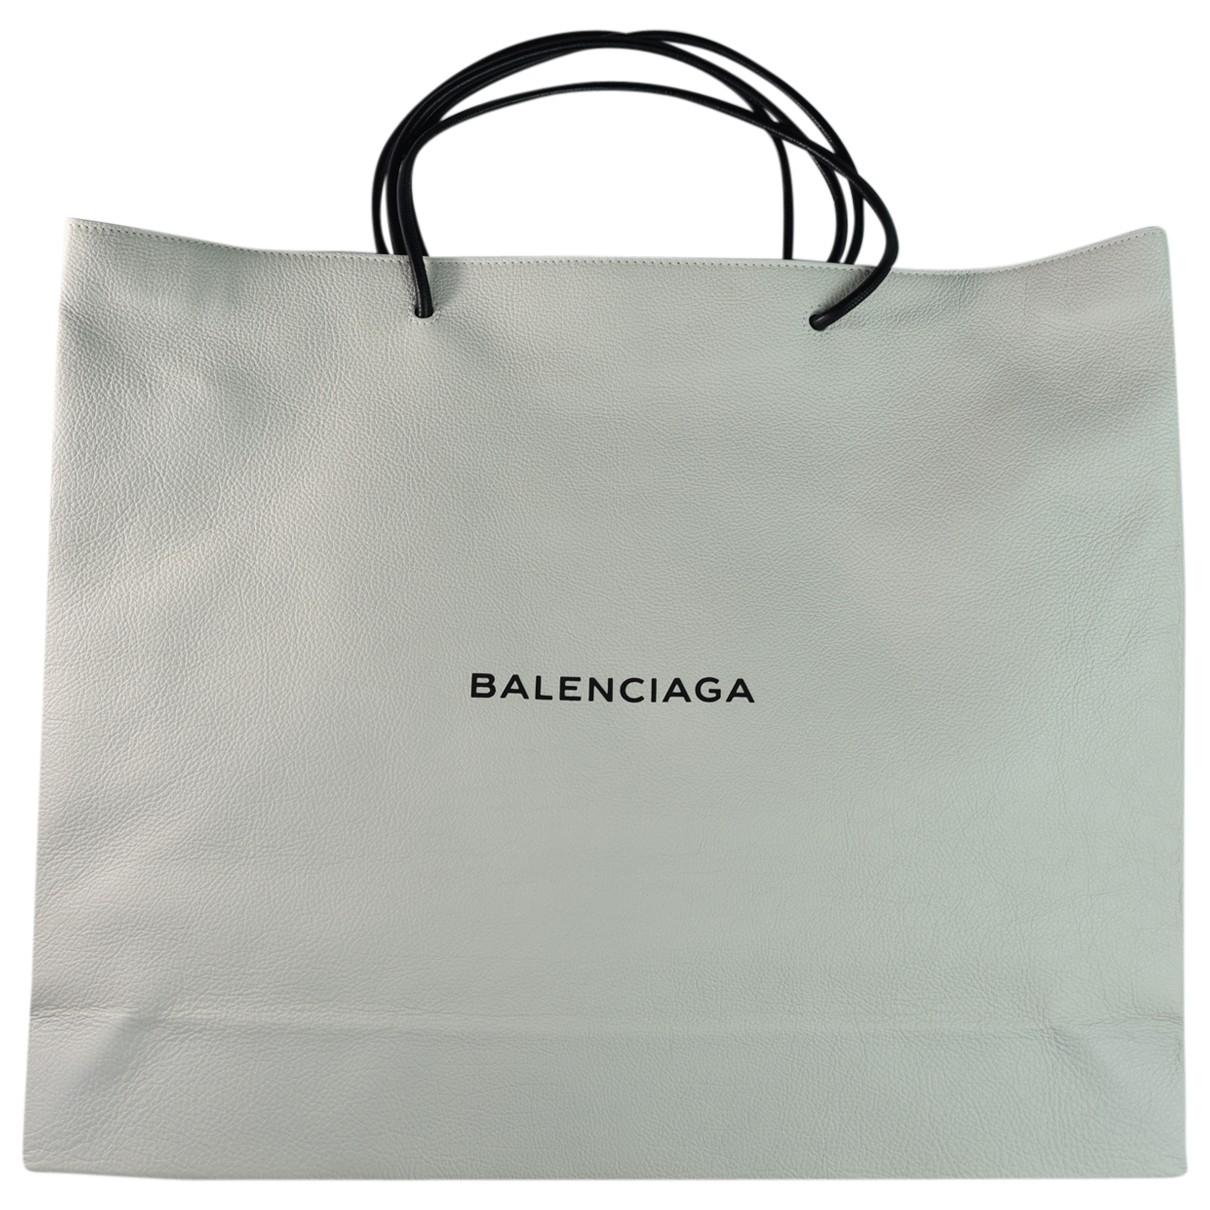 Balenciaga Shopping North South Handtasche in  Weiss Leder